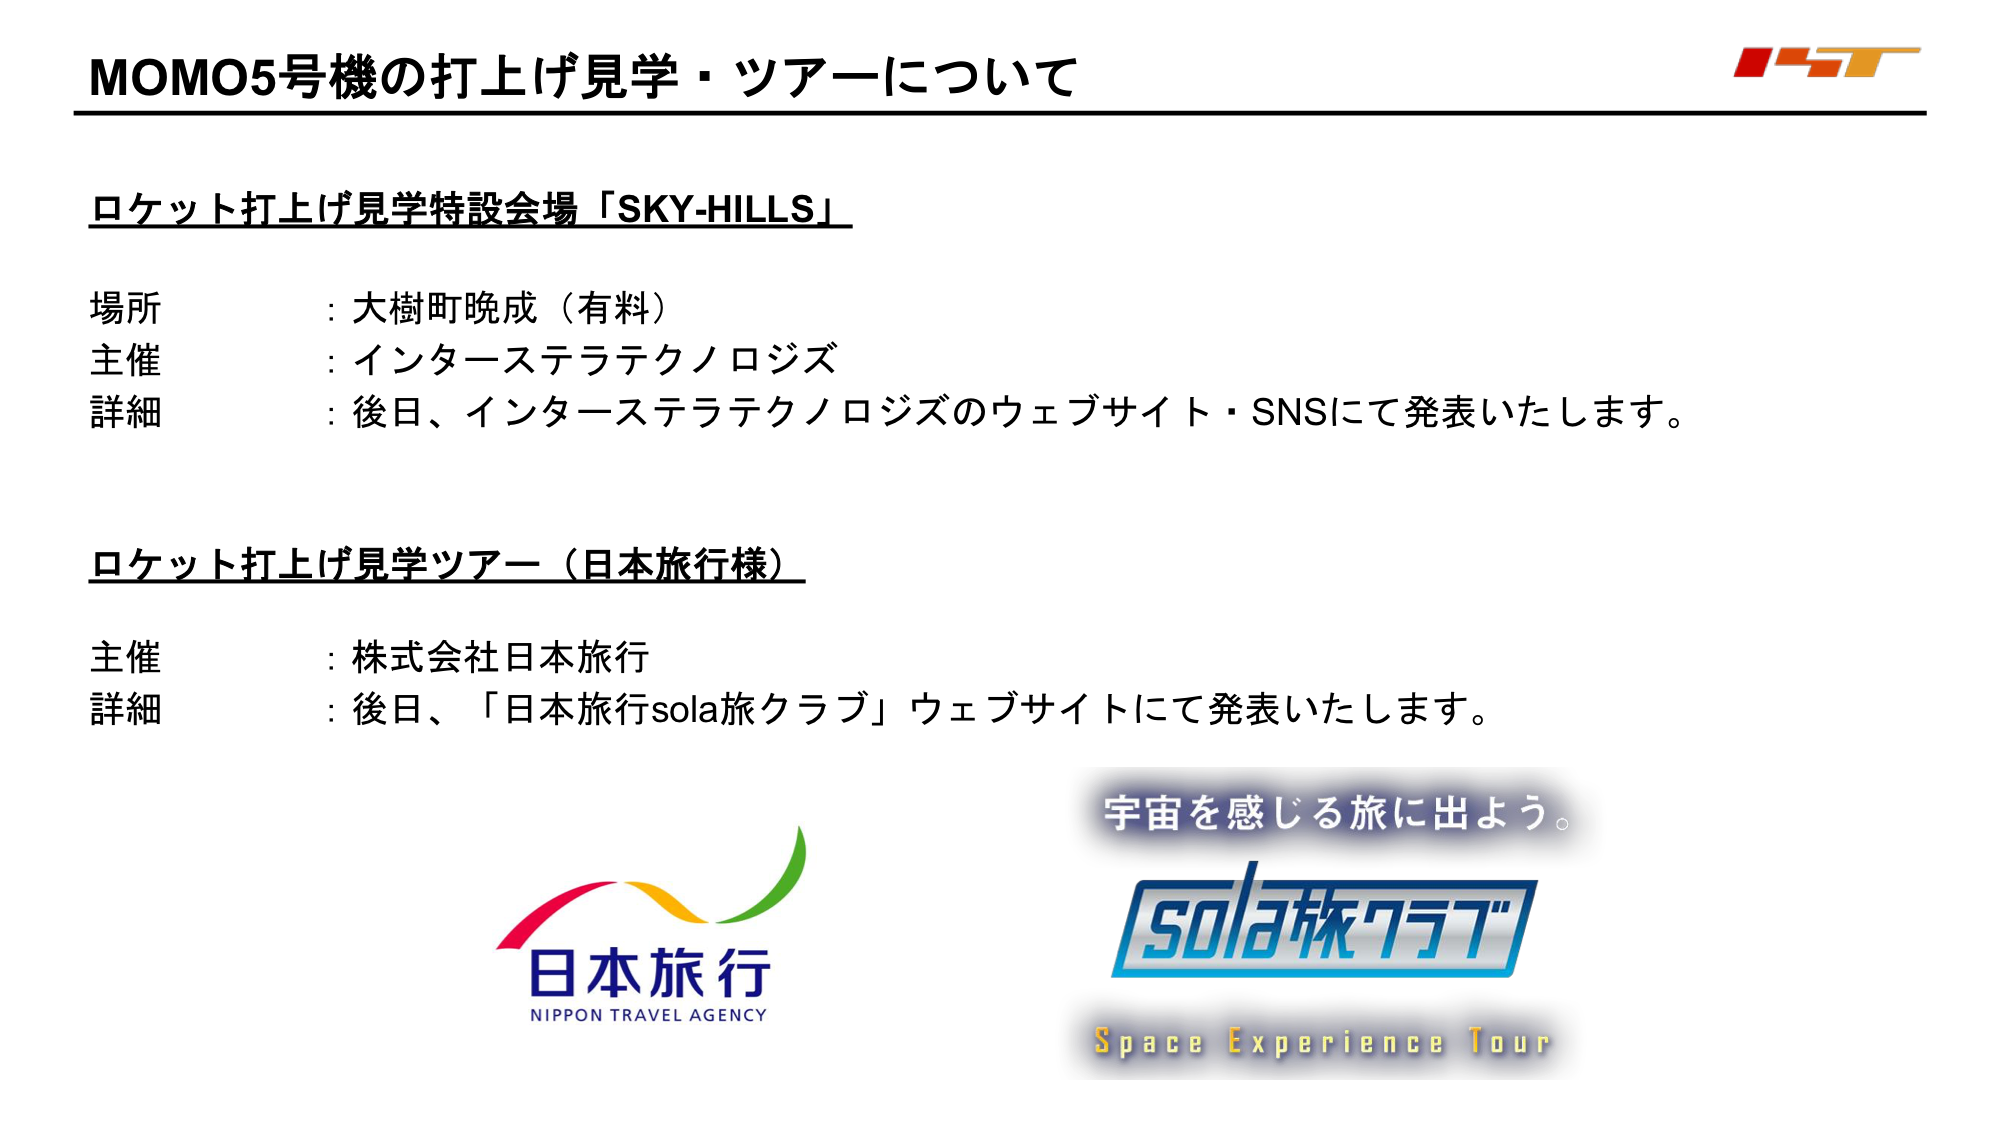 f:id:Imamura:20191126135333p:plain